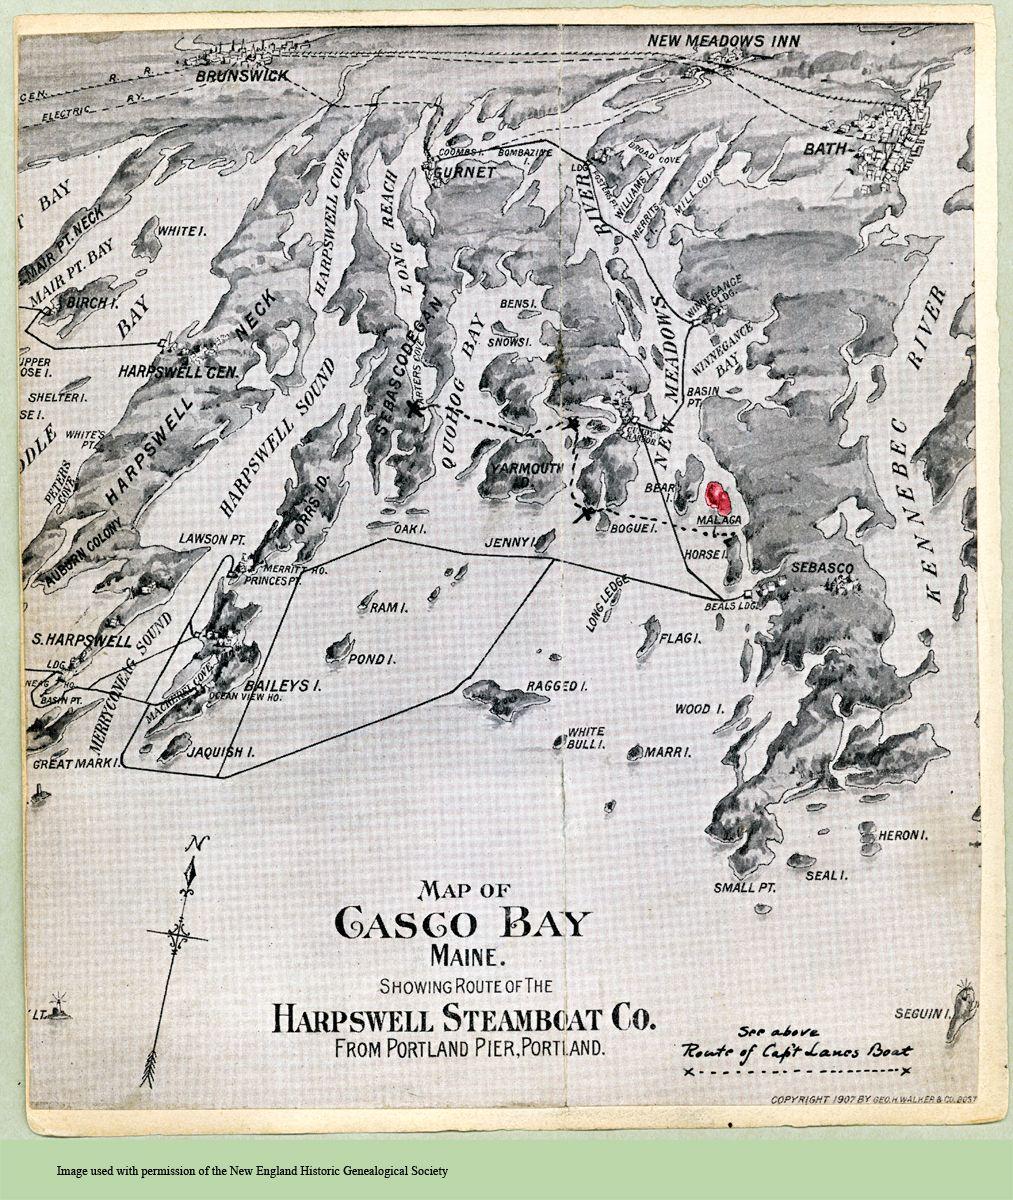 Map, Malaga Island, 1907. Ms. A. Lane Sbook c.1900-Pg26 ... on cliff island maine map, bailey island maine map, star island maine map, little tall island maine map, appledore island maine map, long island maine map, orrs island maine map,